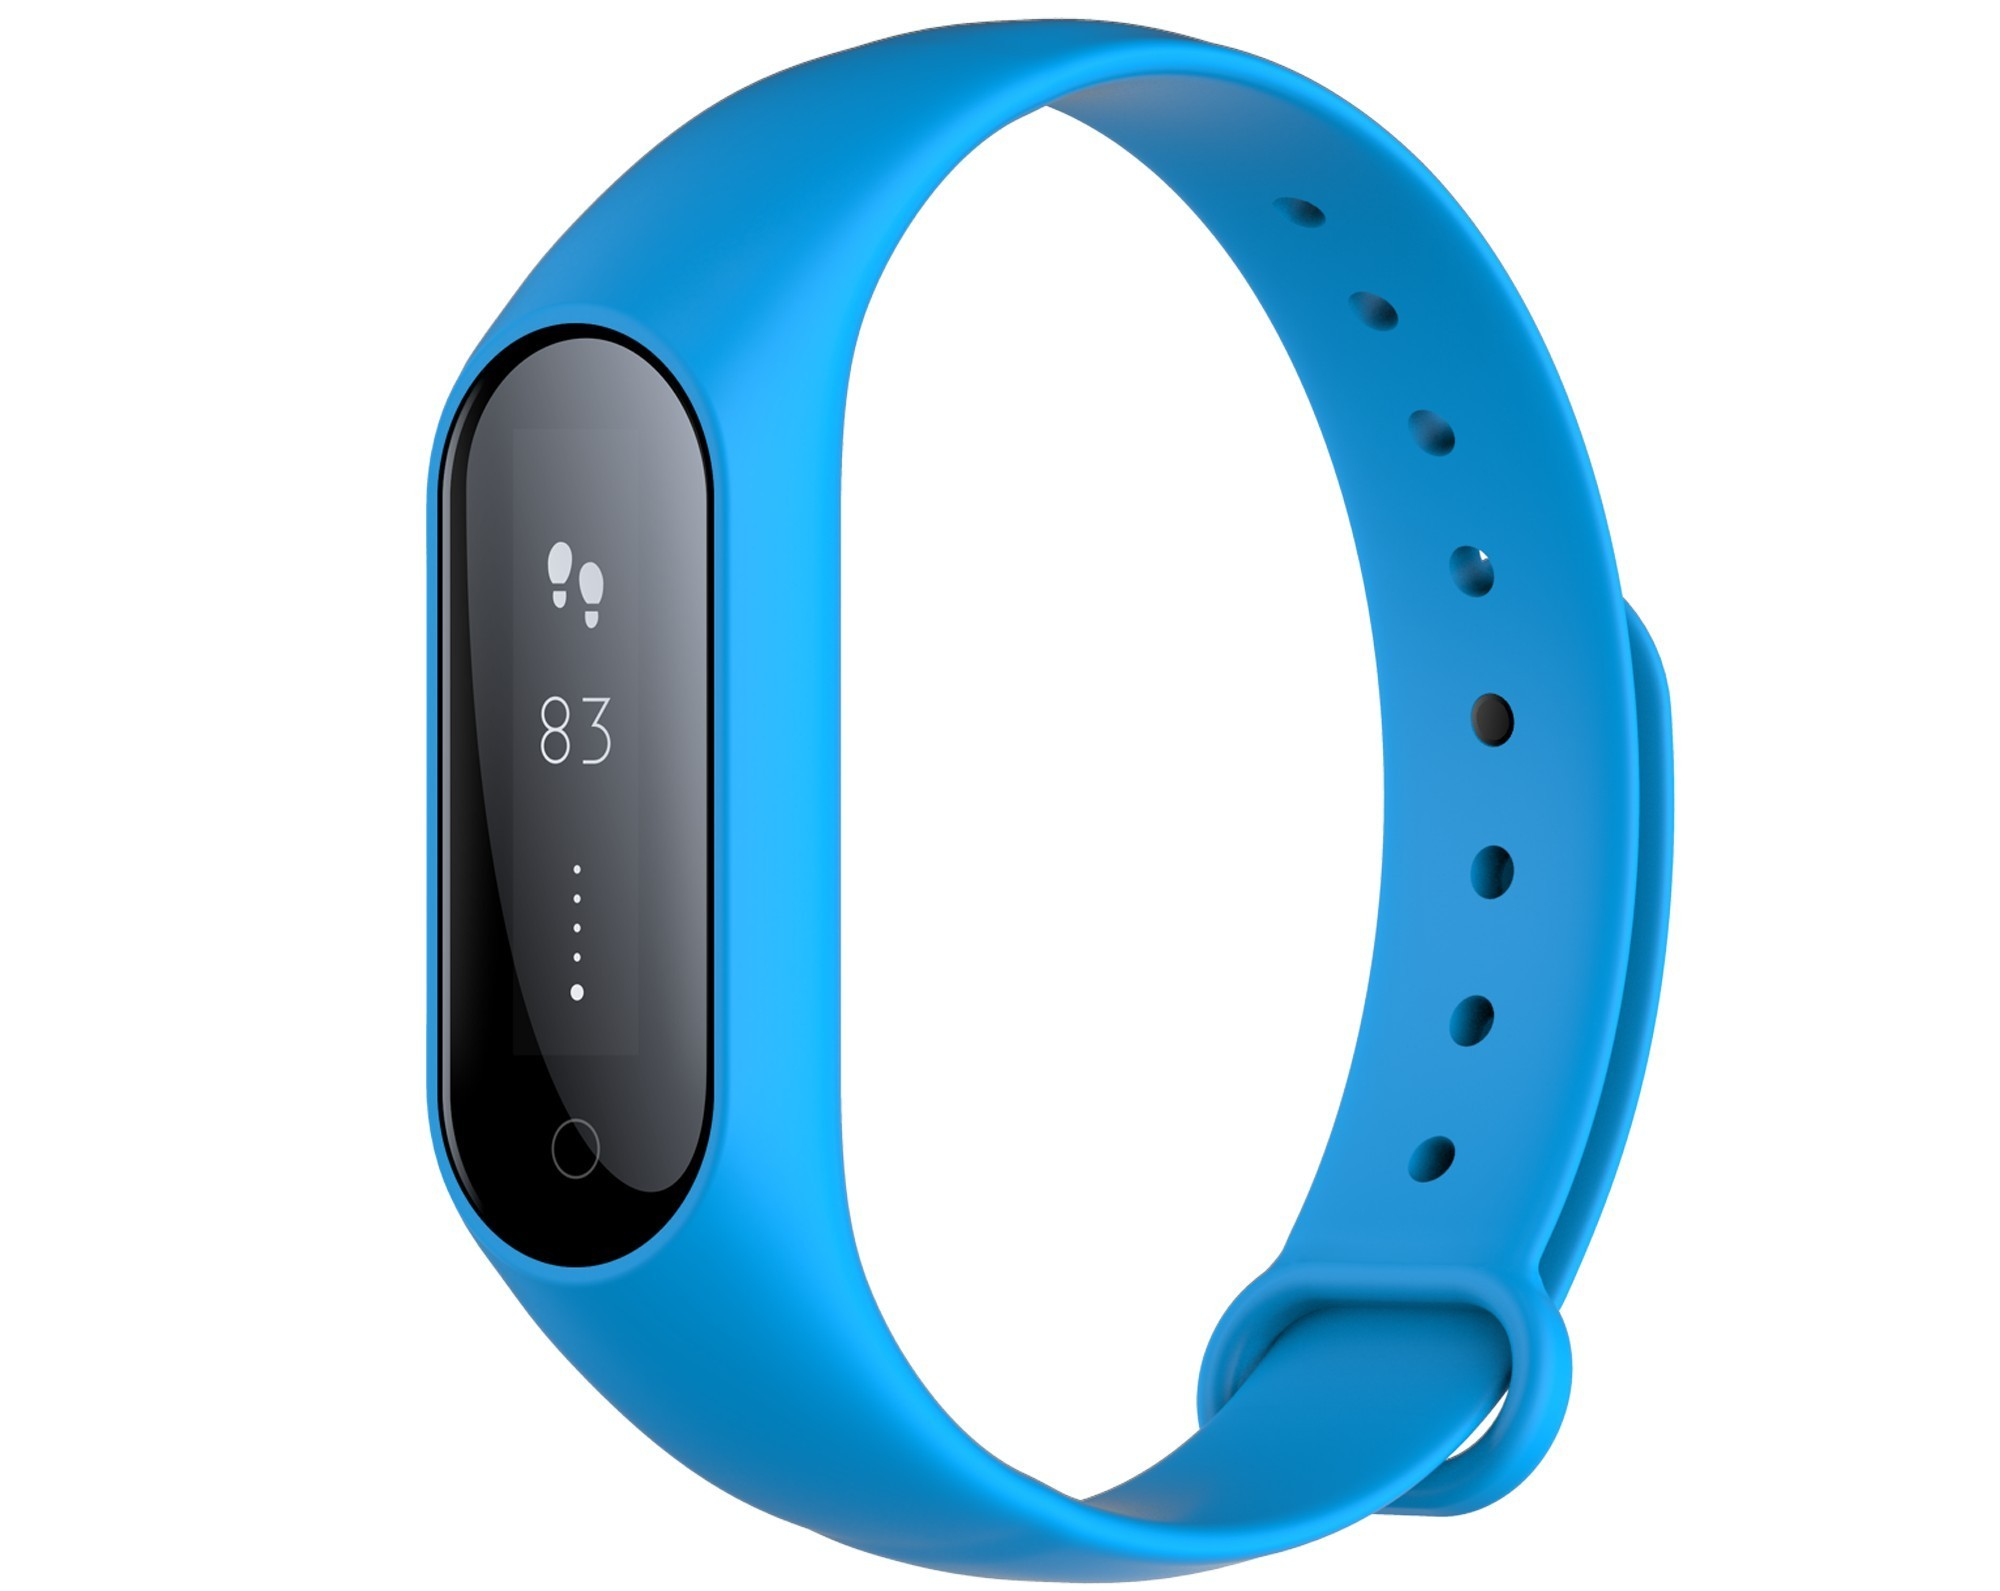 Bratara fitness iUni Y3, Bluetooth, display OLED, Notificari, Pedometru, Monitorizare Sedentarism, Puls, Blue imagine techstar.ro 2021